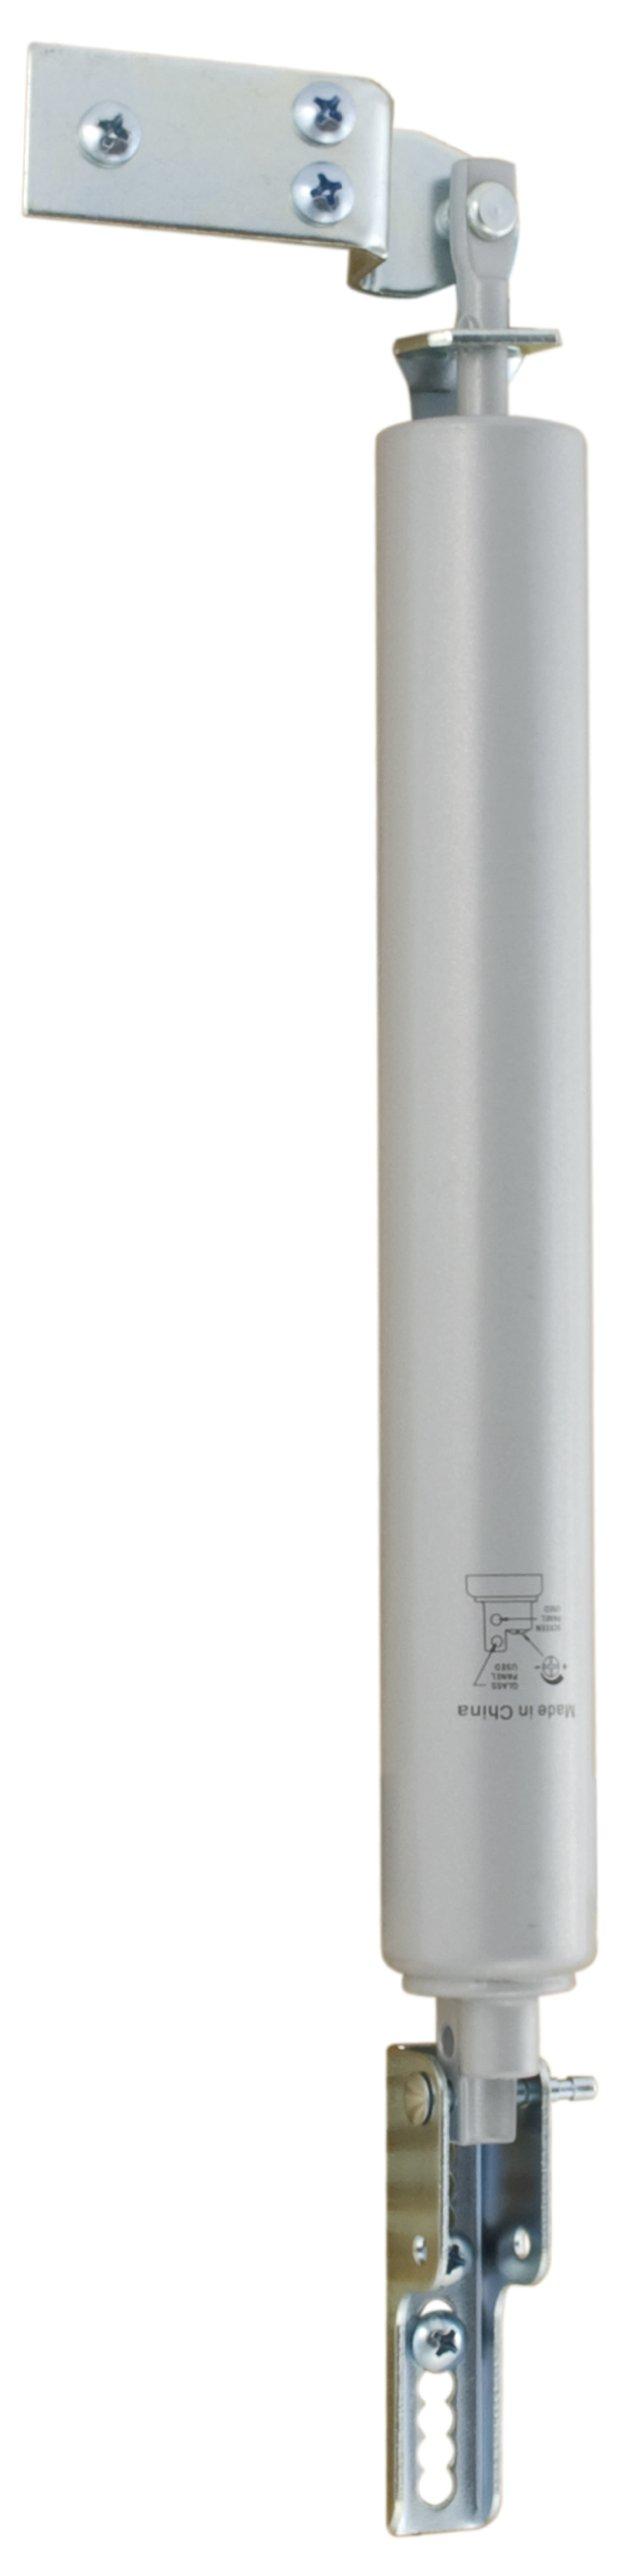 Wright Products VJ1020CAL Pneumatic Aluminum Screen Door Closer For Wood Or Metal Out Swinging Doors